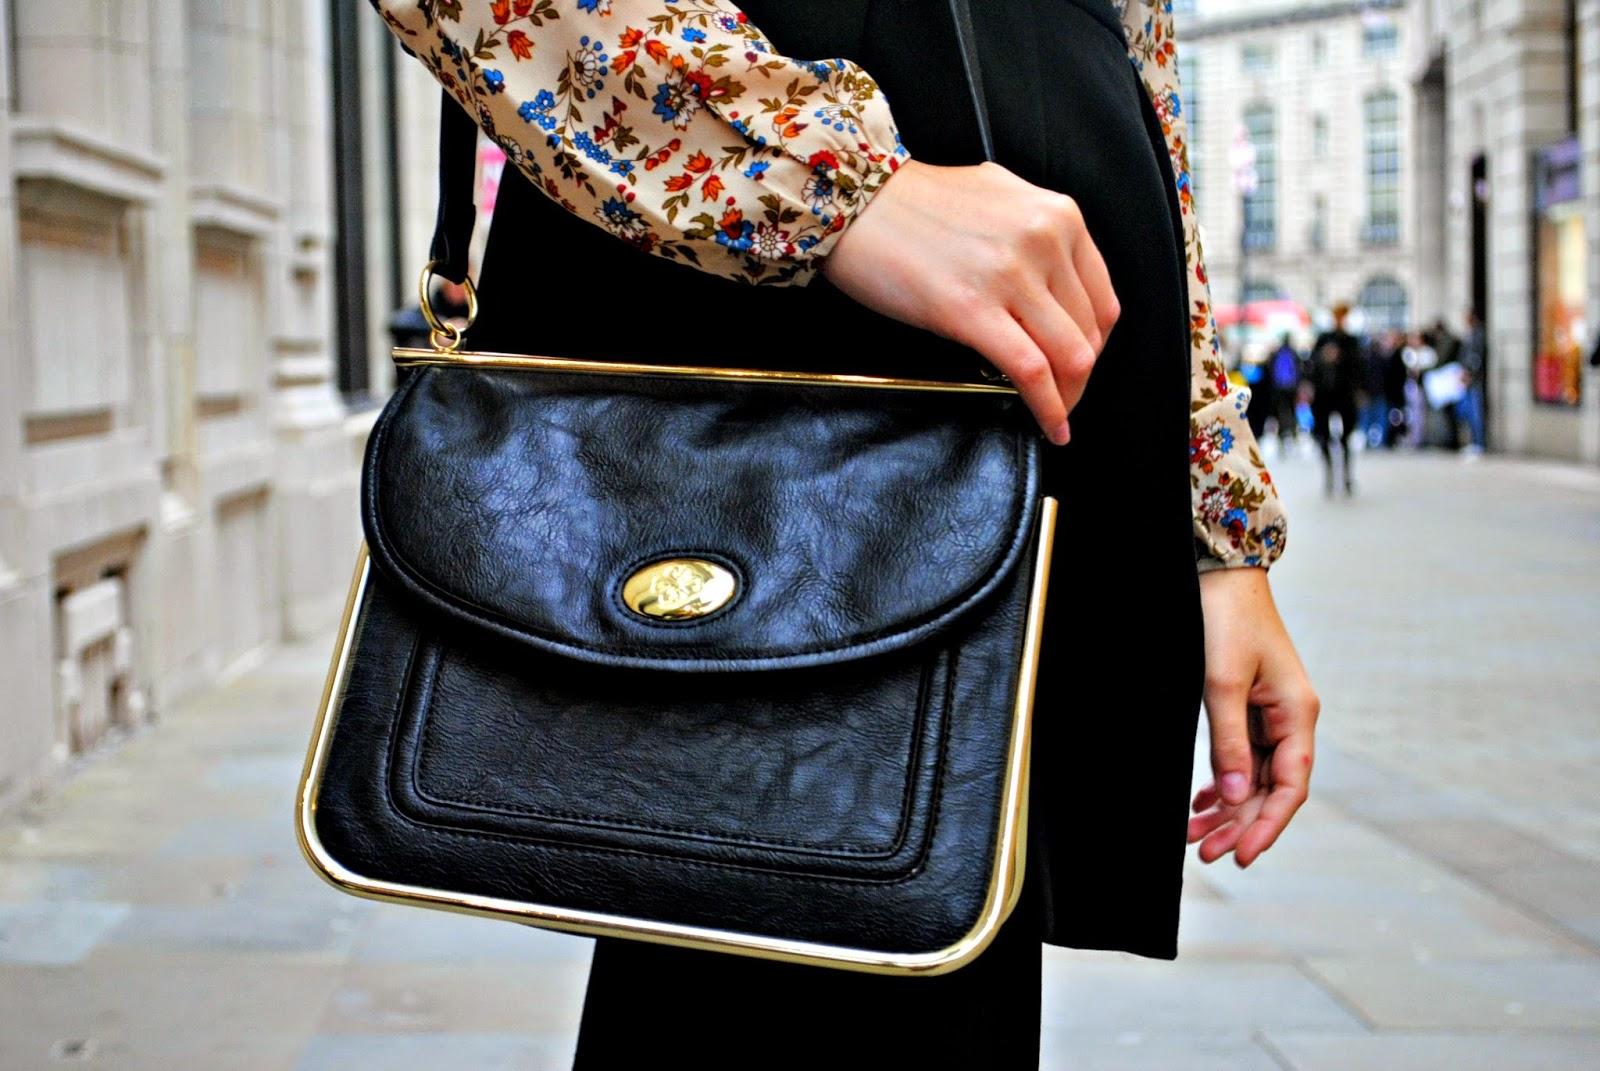 Stradivarius boho vintage blouse with Mischa Barton handbag